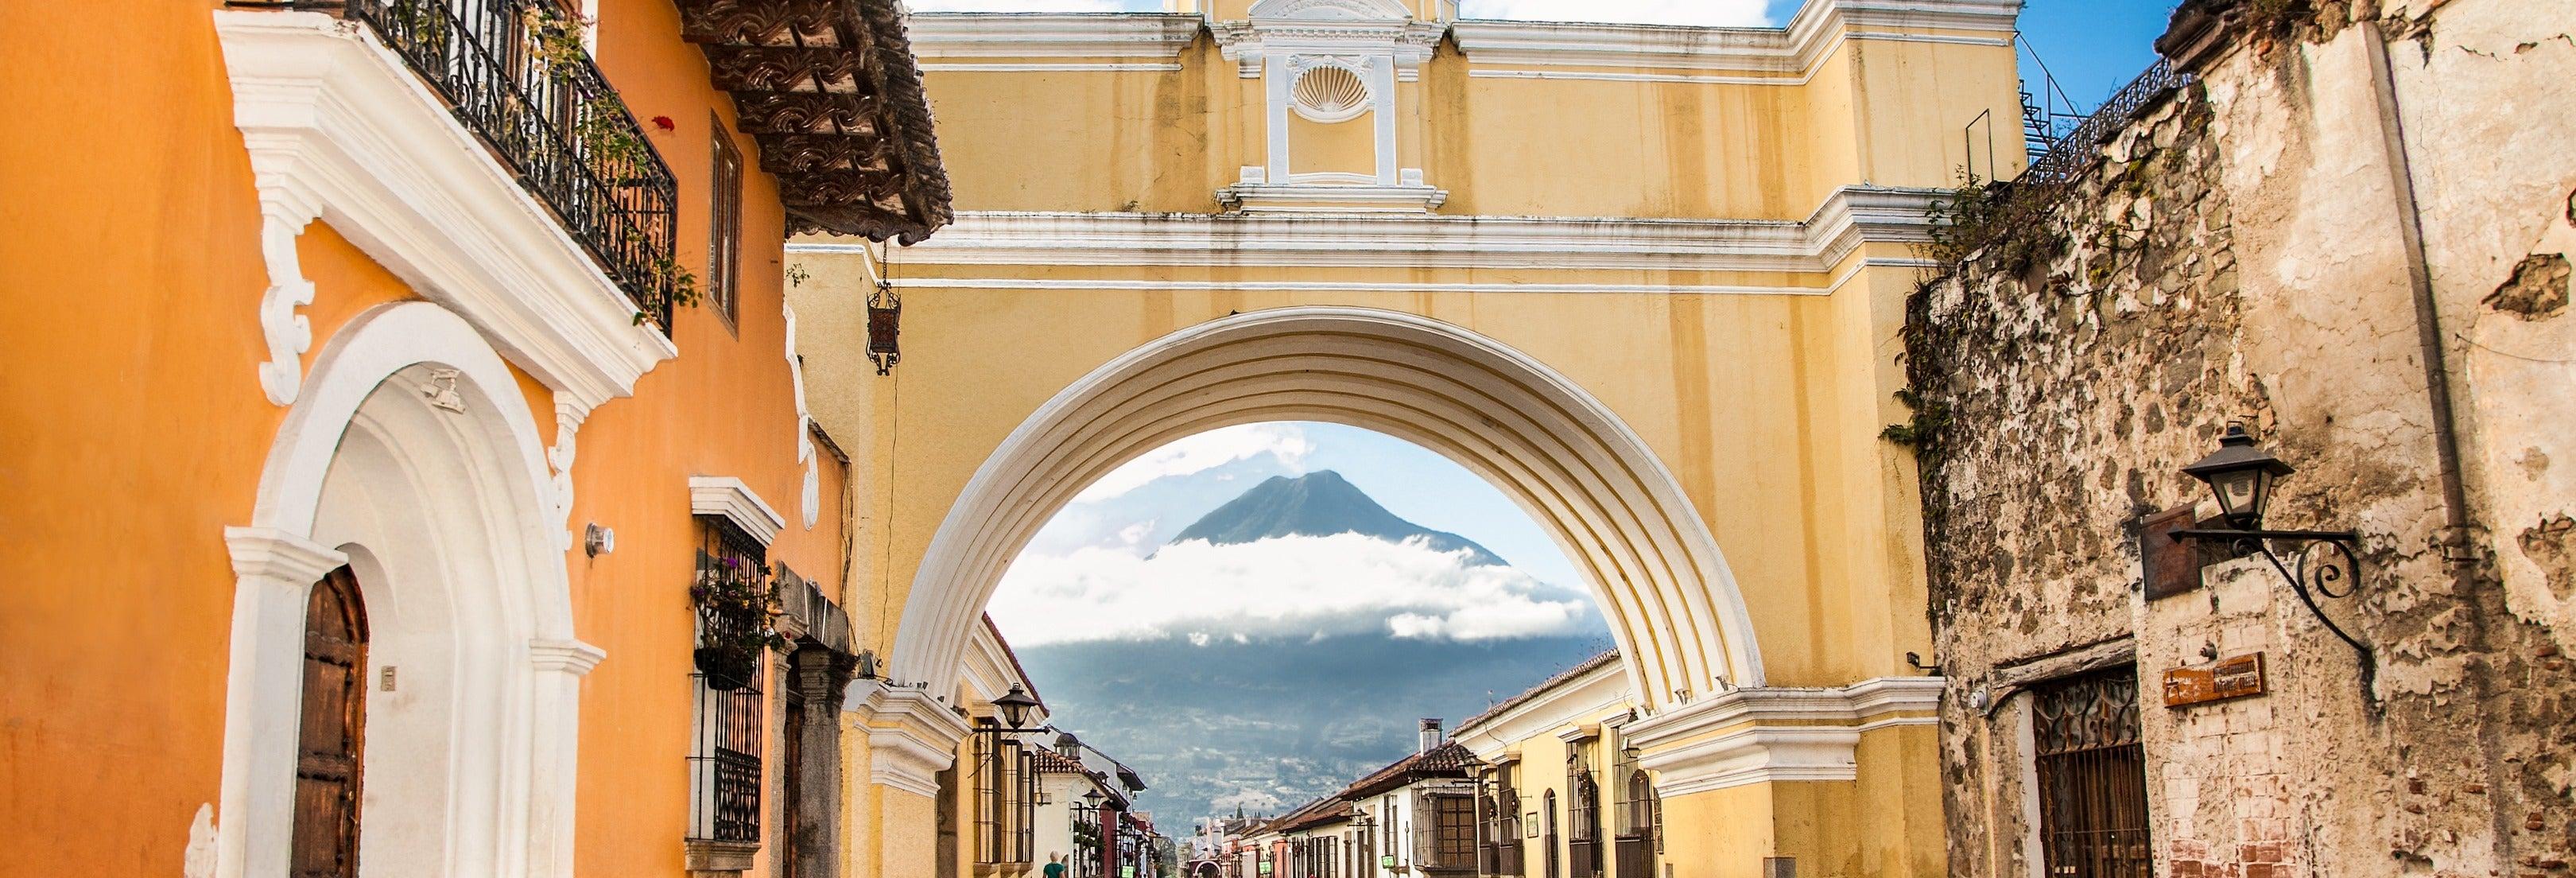 Circuito de 5 ou 6 dias pela Guatemala